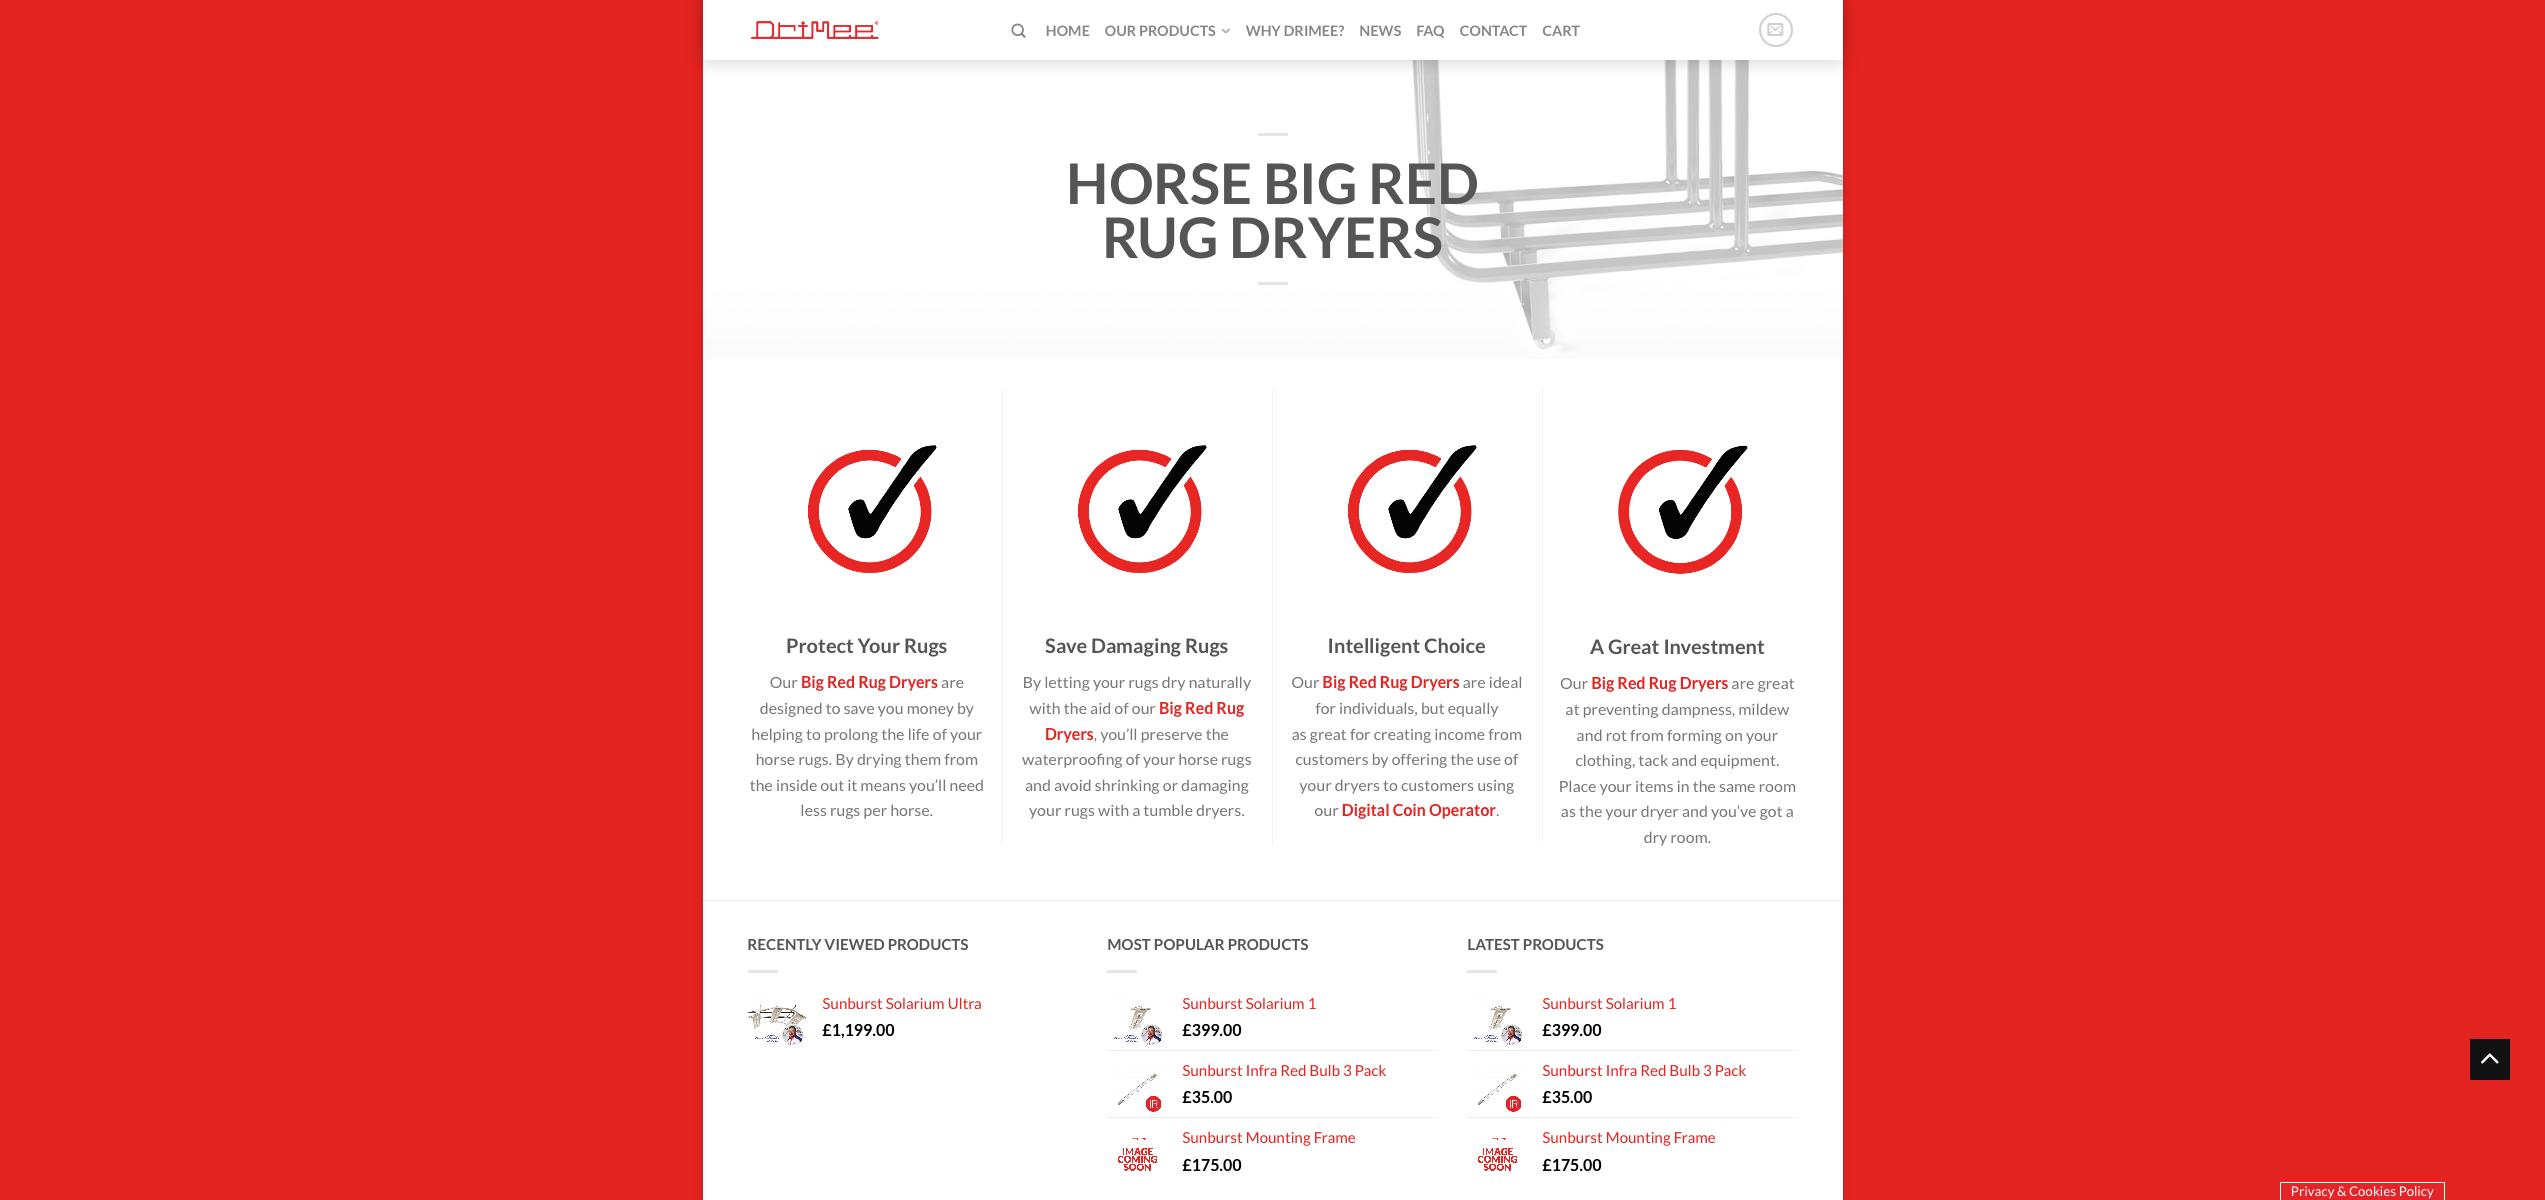 IDEA UK Design and Marketing Drimee Equestrian Horse Equipment Website Design 16